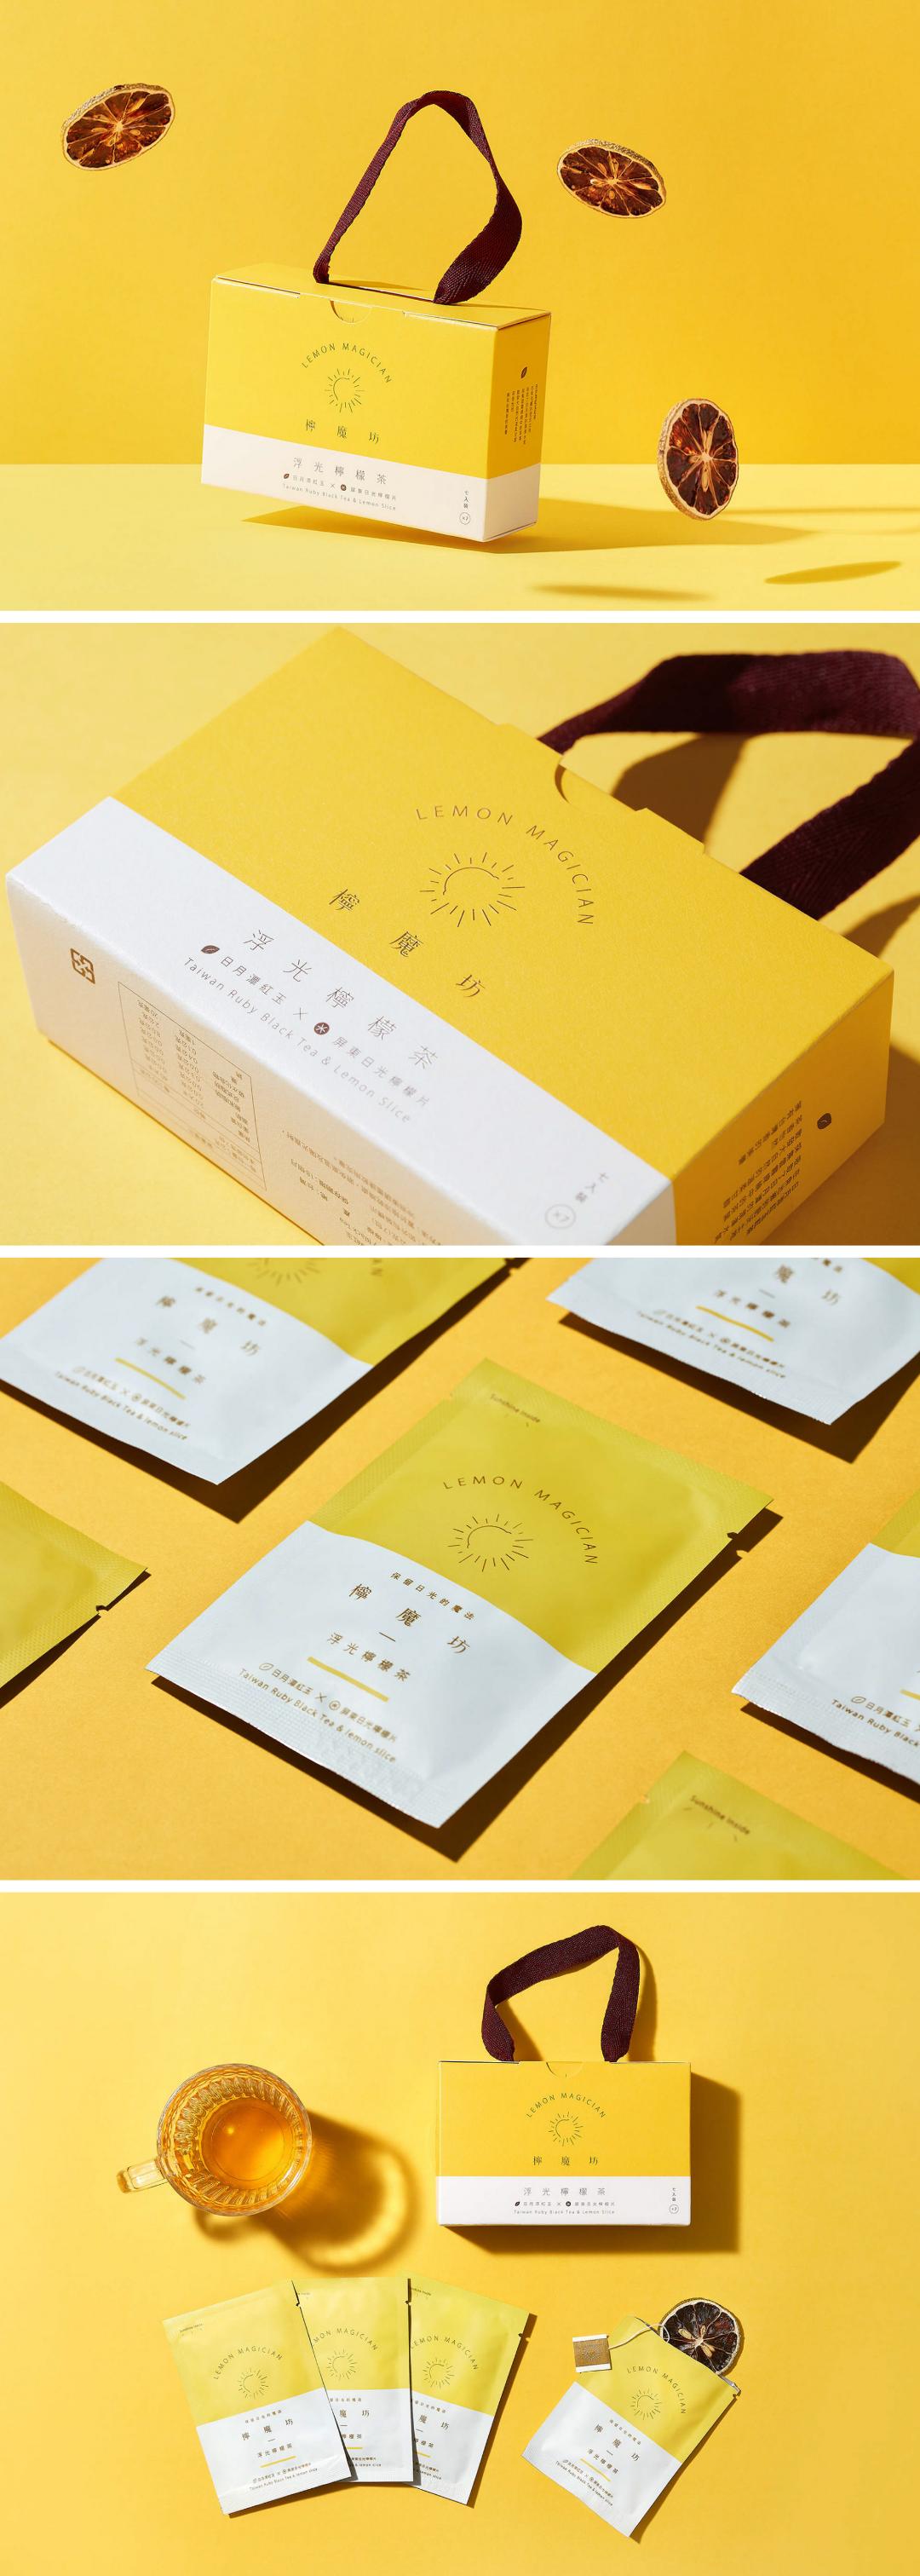 packaging ,Branding,Graphic Design,Art Direction